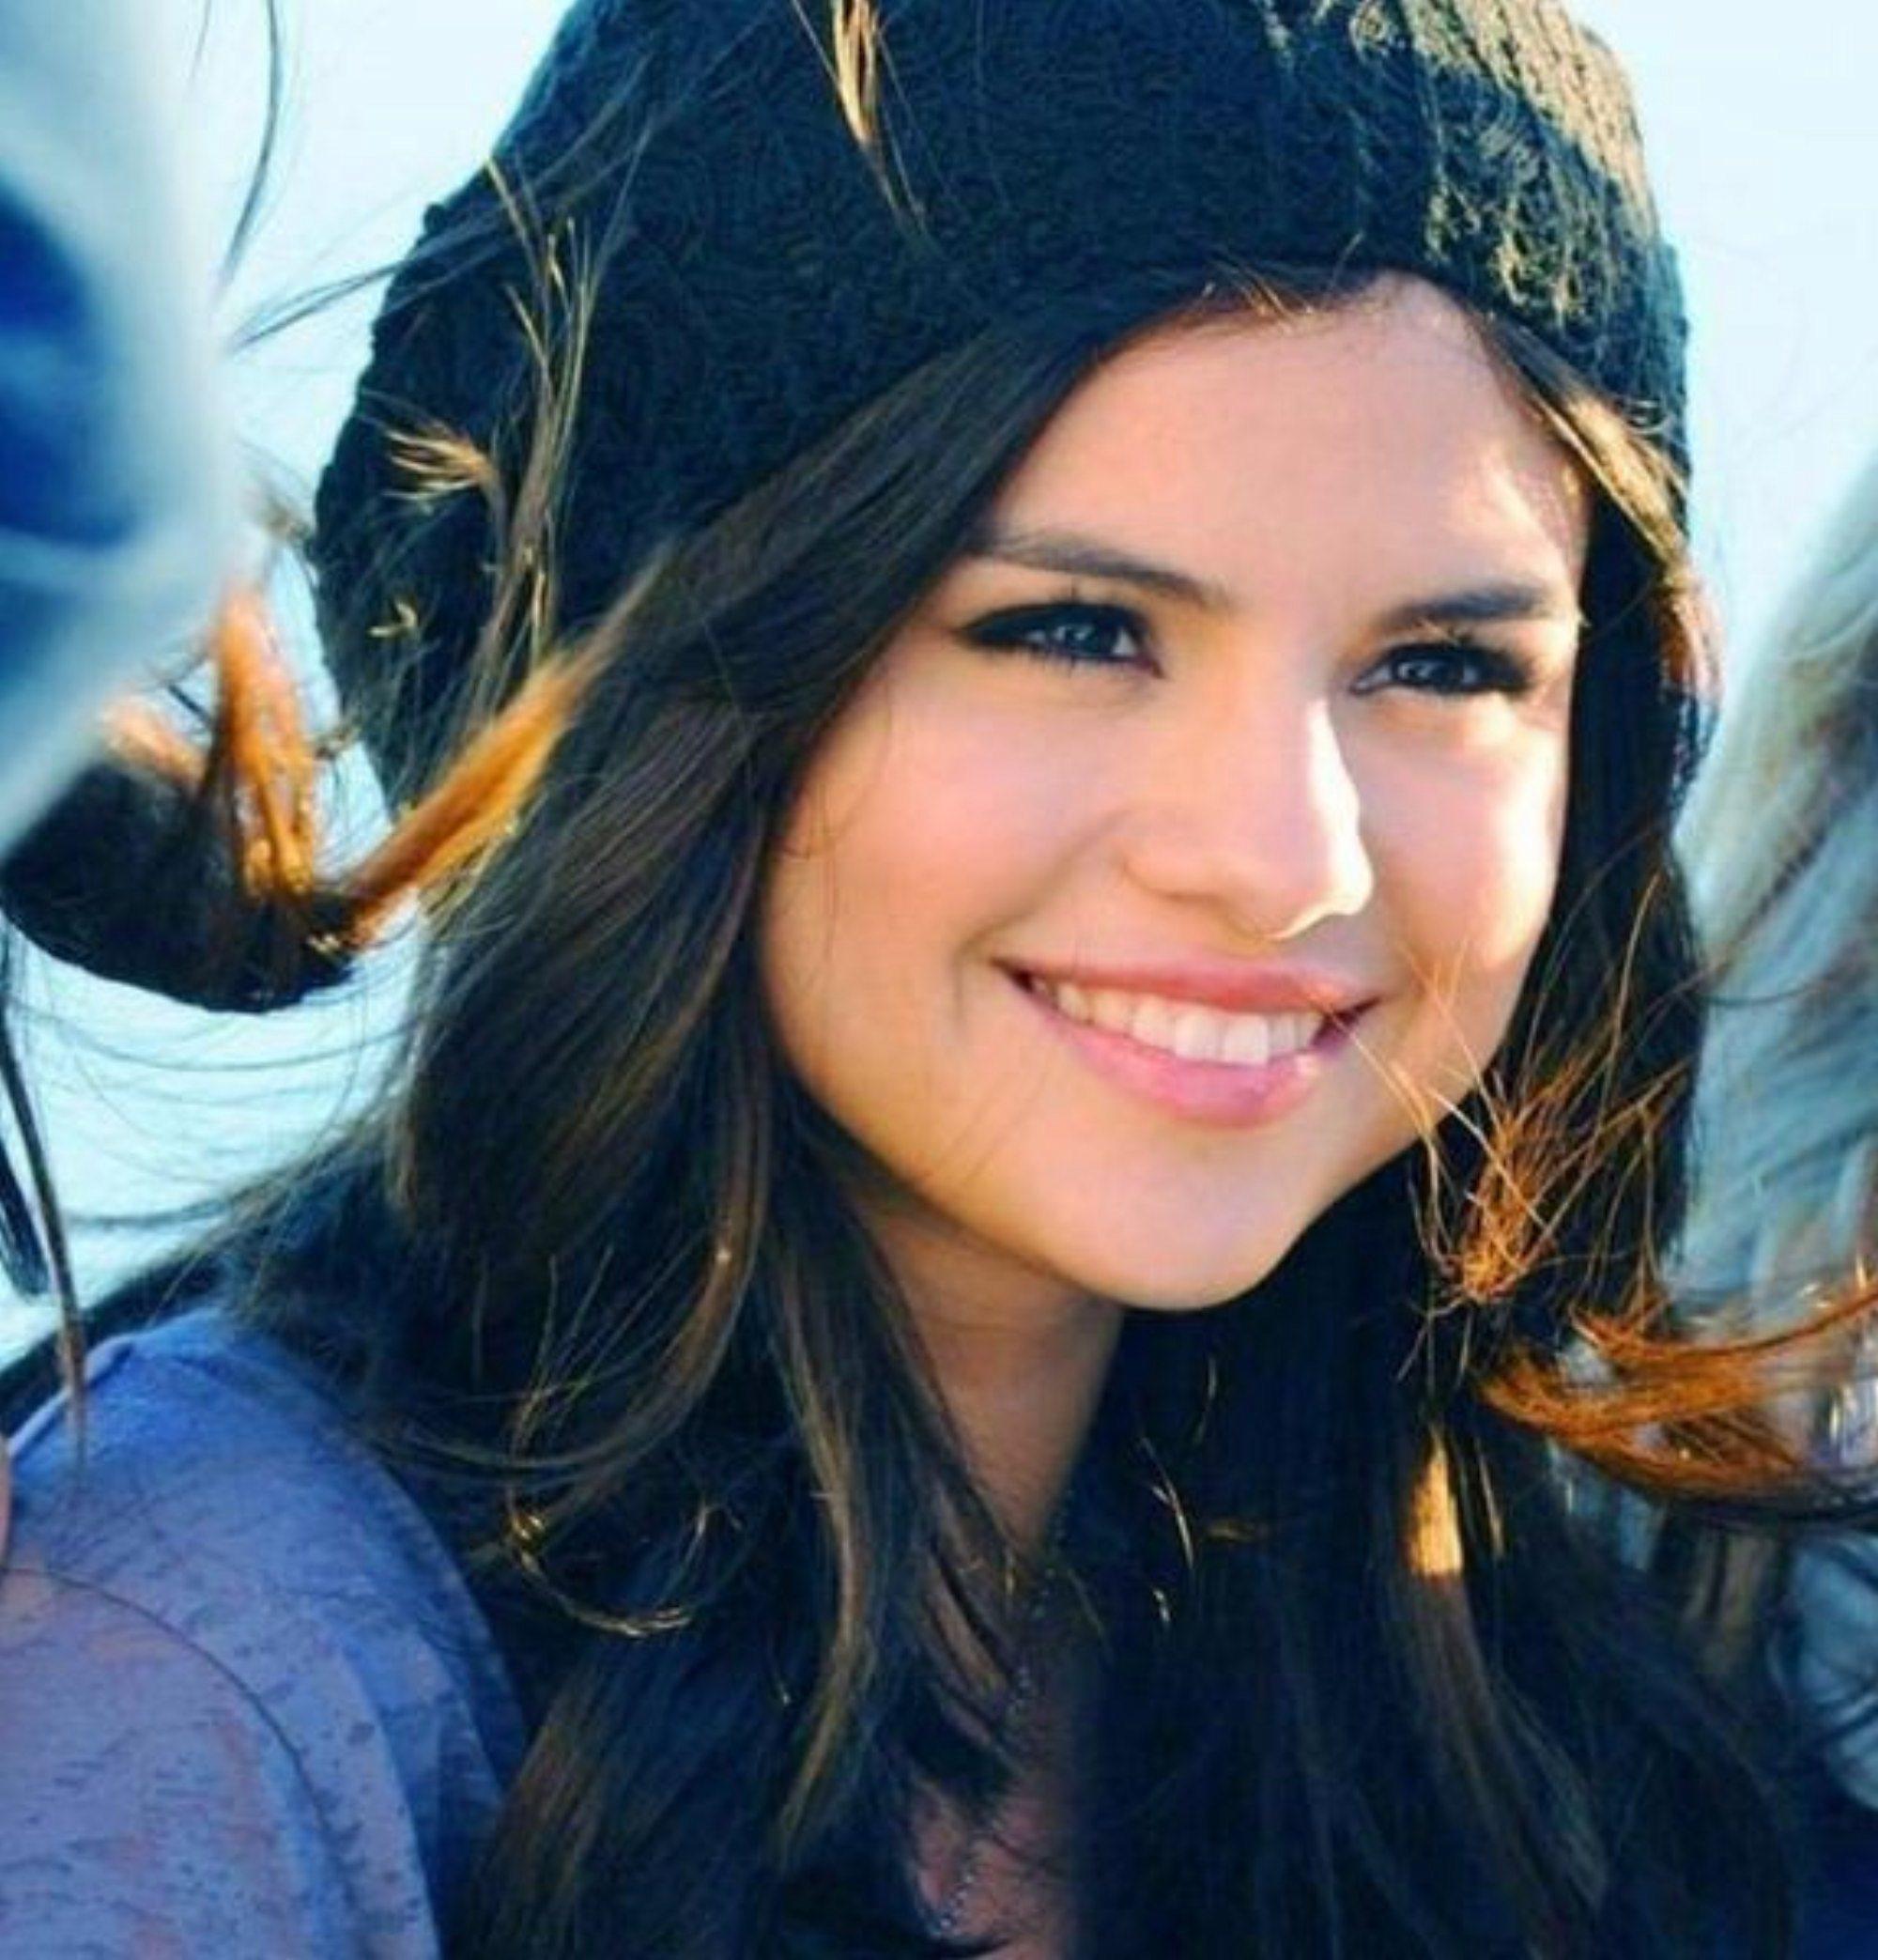 Avatar - Selena Gomez